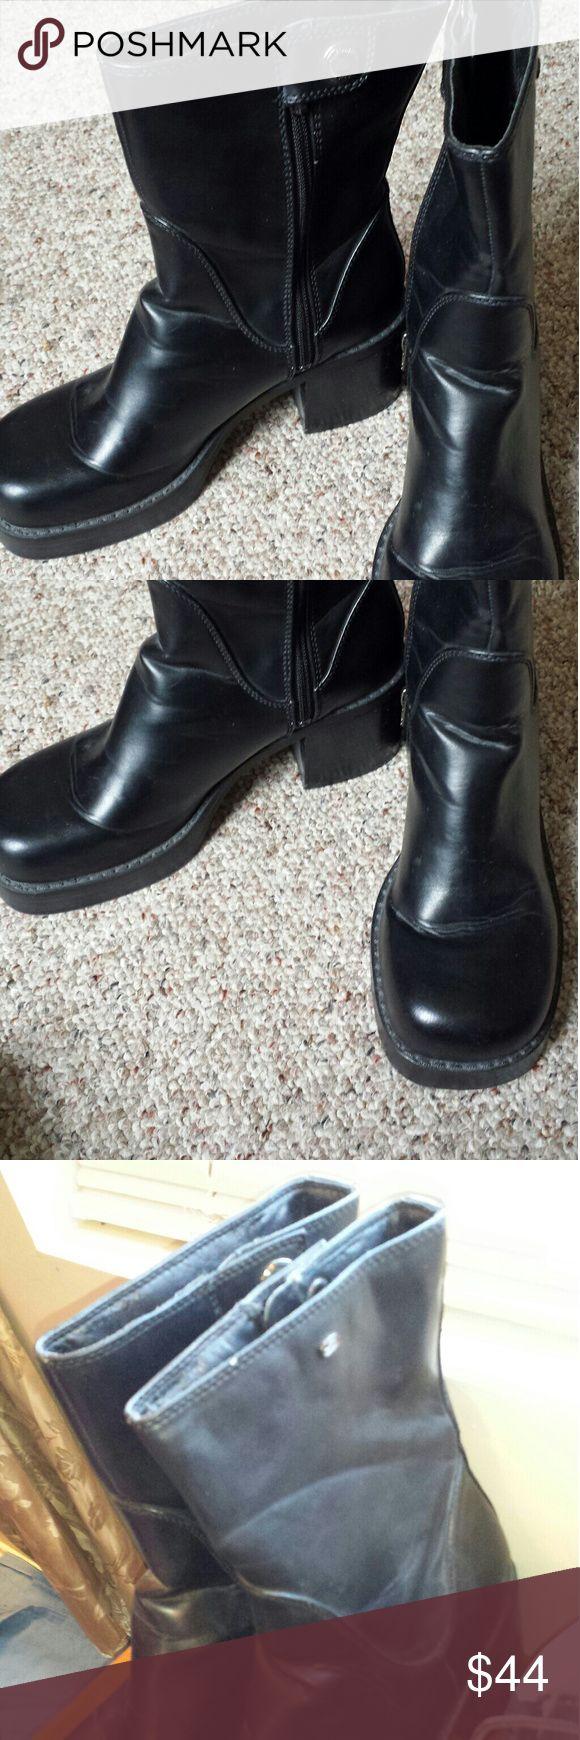 Skechers chunky heel boot. Black sketcher boots. Side zip up. Worn 3 times. Has chunky heel. Comfortable feel Skechers Shoes Heeled Boots